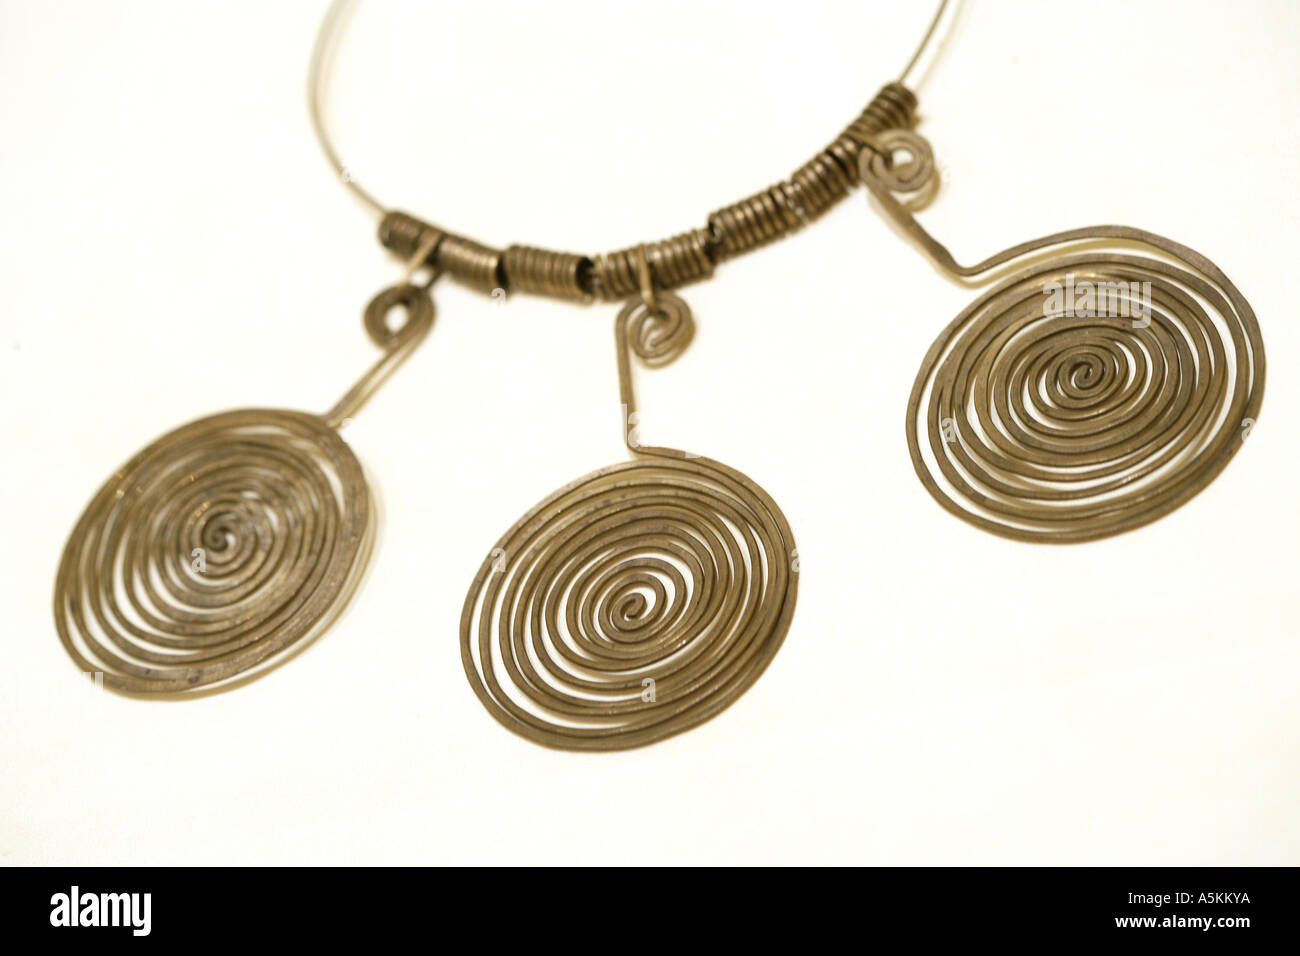 Alexander Calder Copper Jewelry - Stock Image